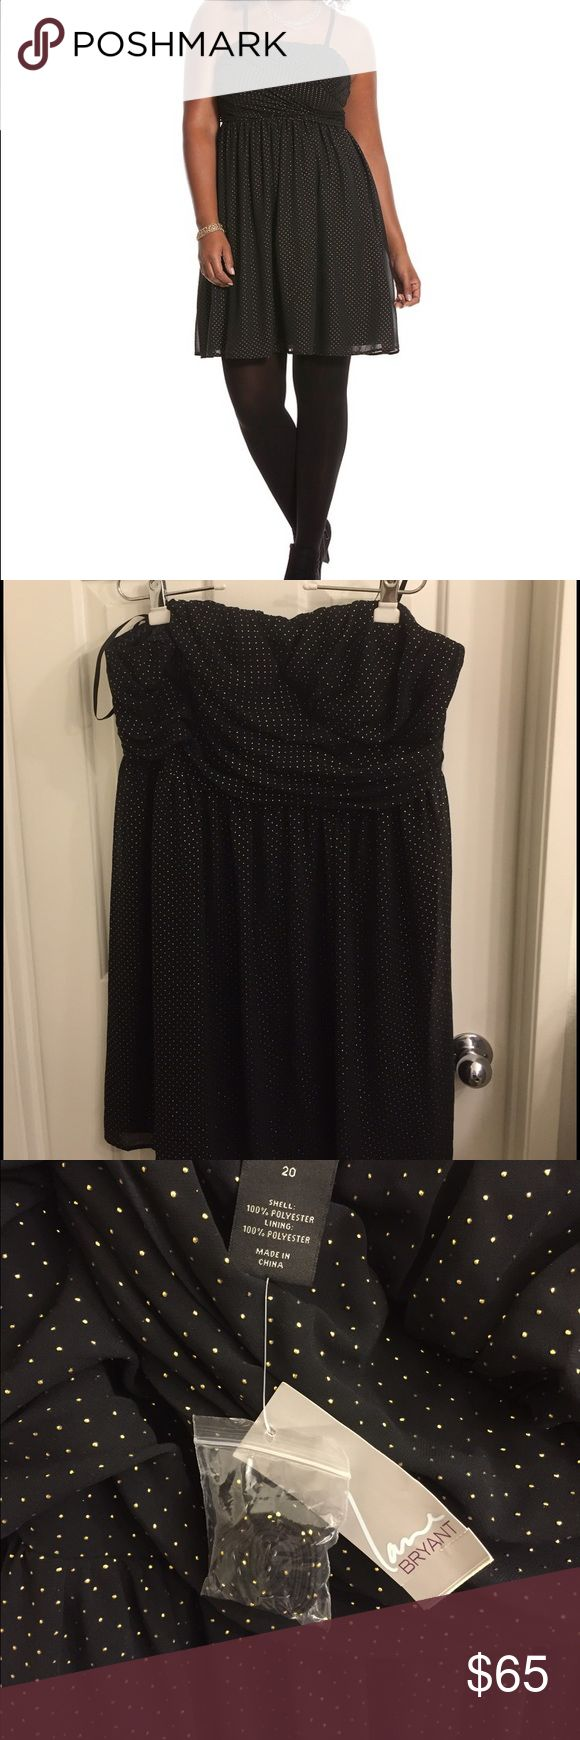 NWT Lane Bryant Black Tube dress with gold studs NWT Lane Bryant size 20 black tube dress with optional strap add-ons. Lane Bryant Dresses Strapless